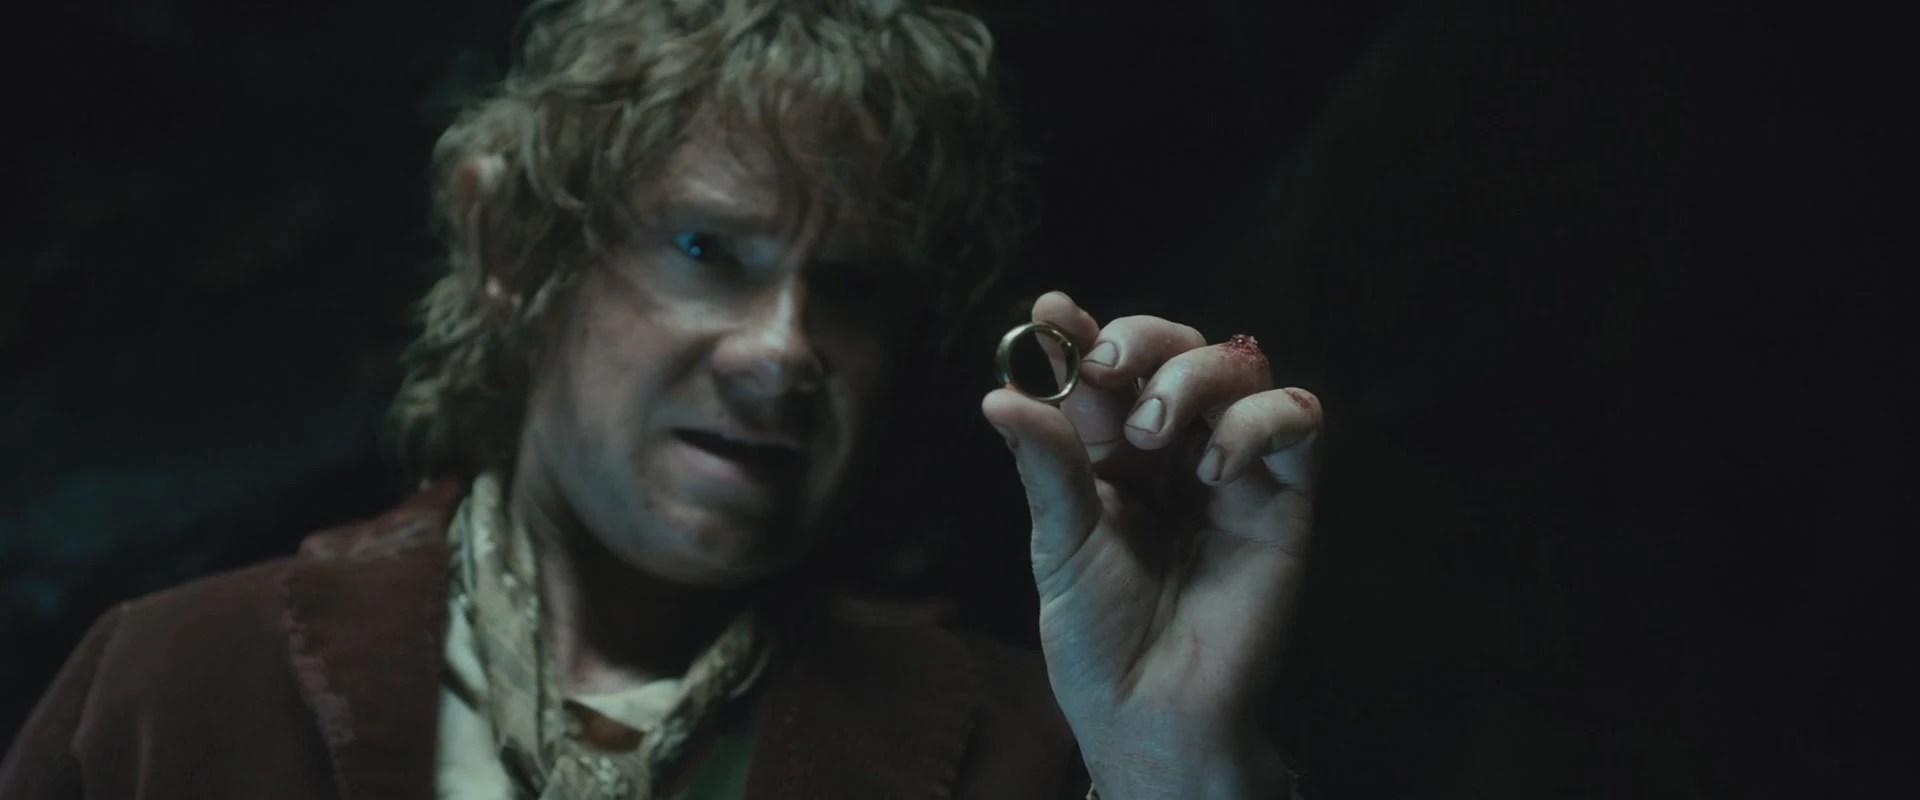 Falling Leaves Live Wallpaper Hd Bilbo Baggins The One Wiki To Rule Them All Fandom